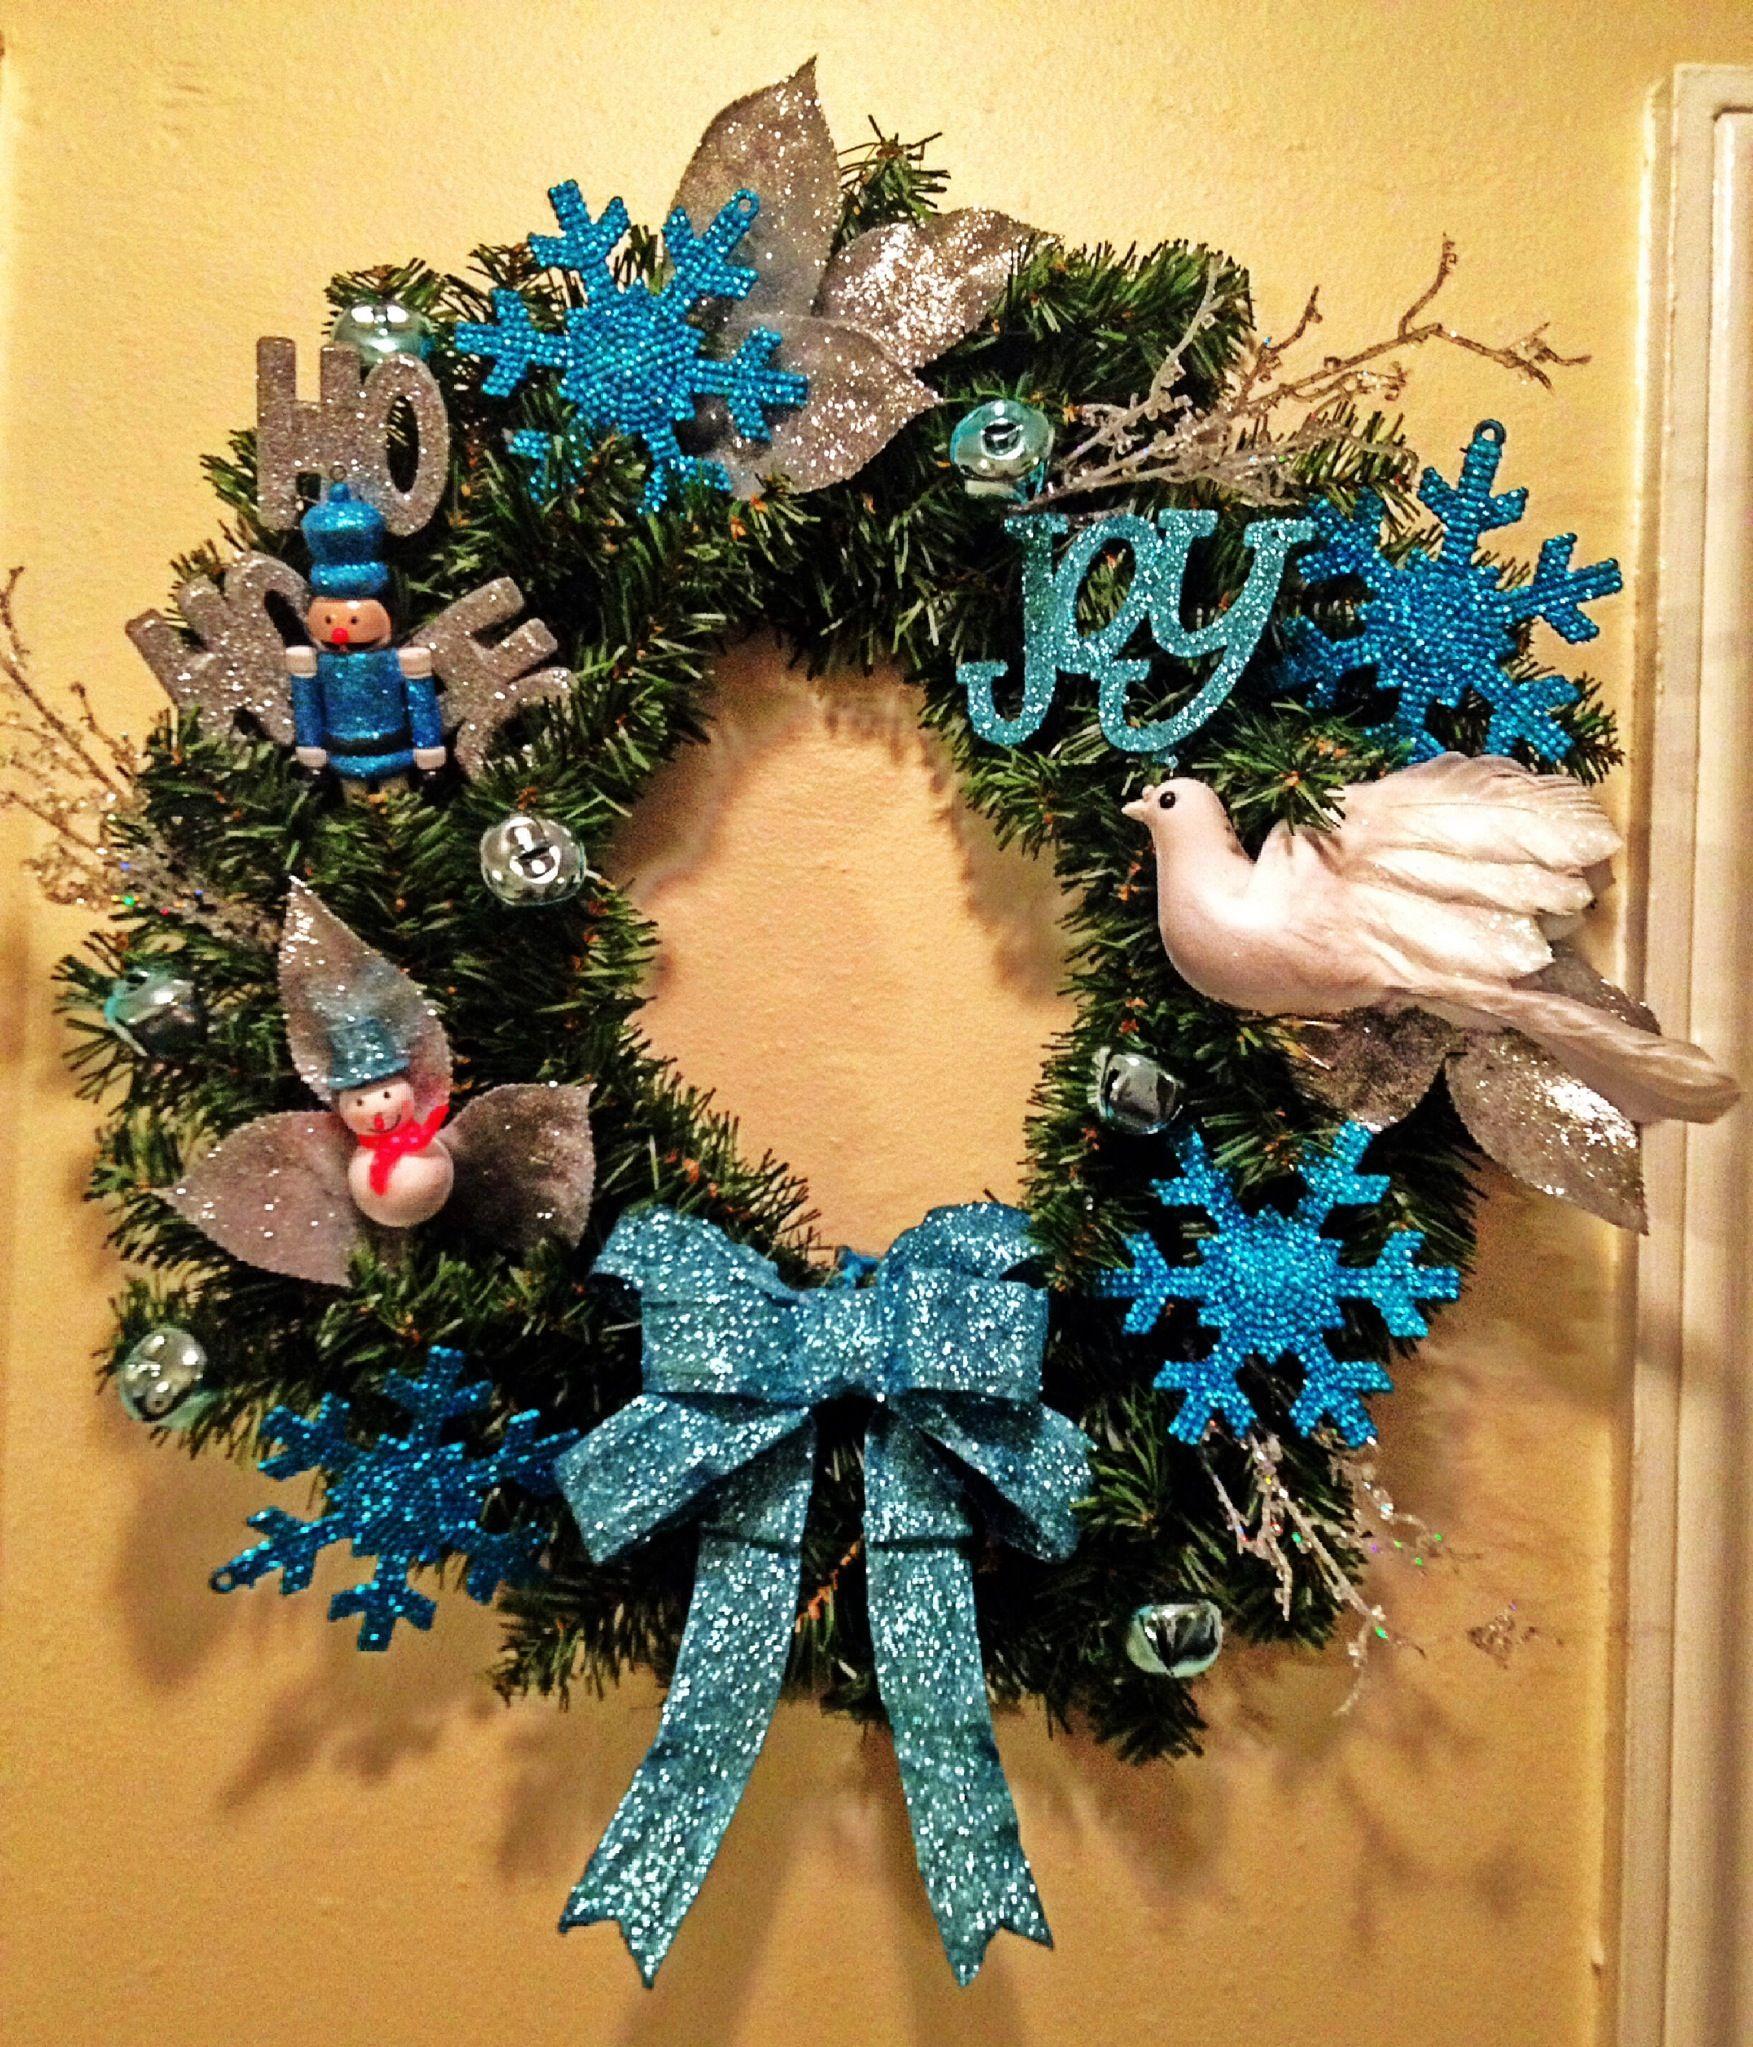 Christmas wreath turquoise diy snowman do it yourself my diy do christmas wreath turquoise diy snowman do it yourself solutioingenieria Gallery